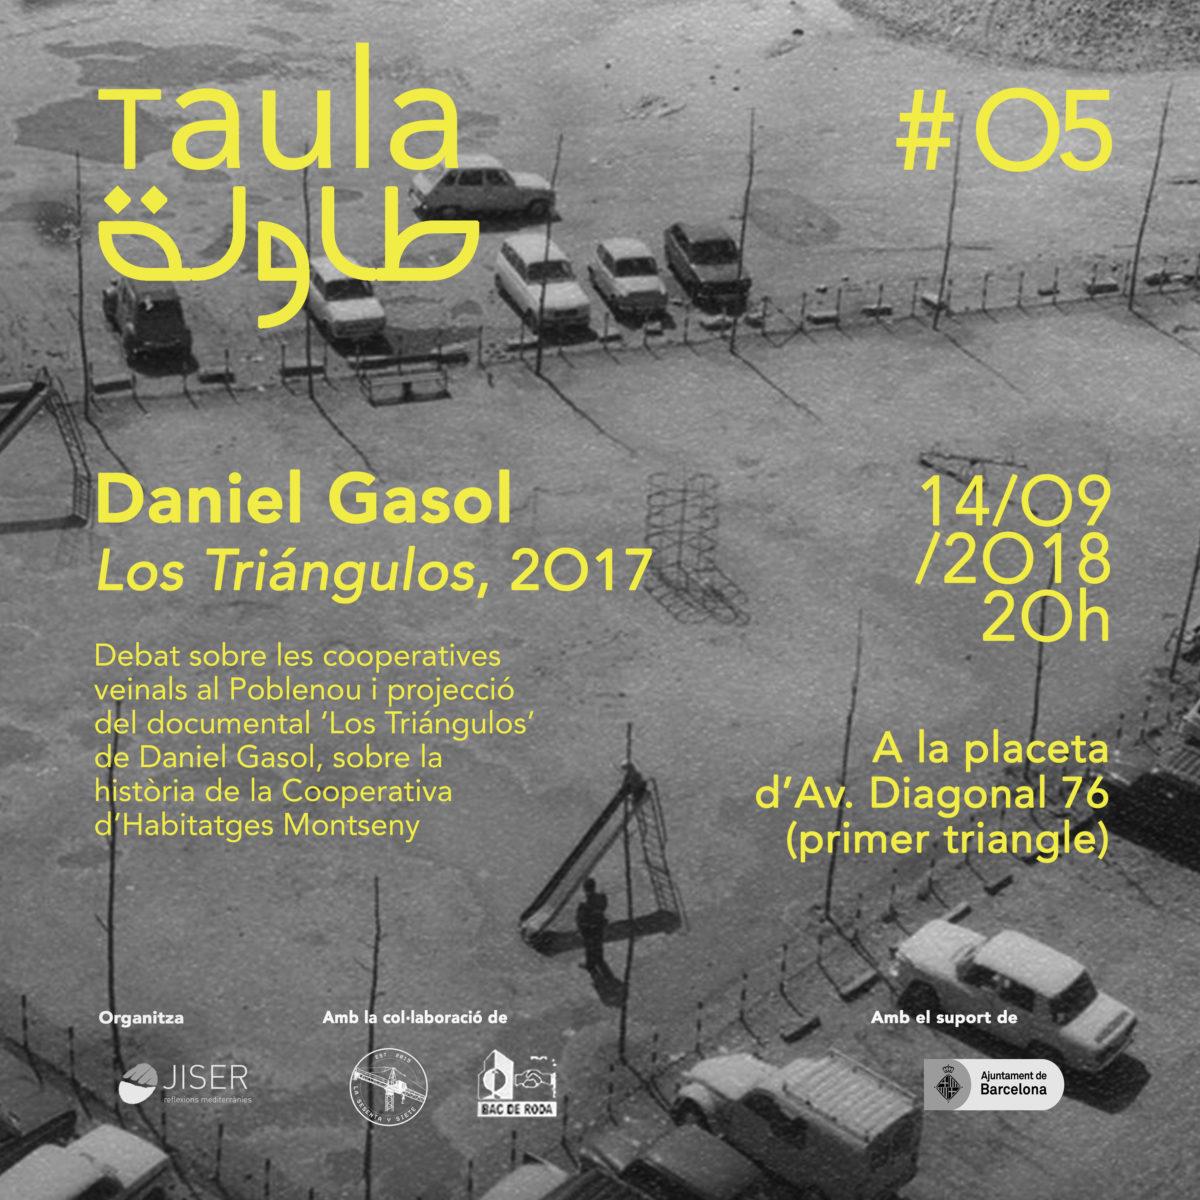 Daniel Gasol, TaulaO5, 2018.